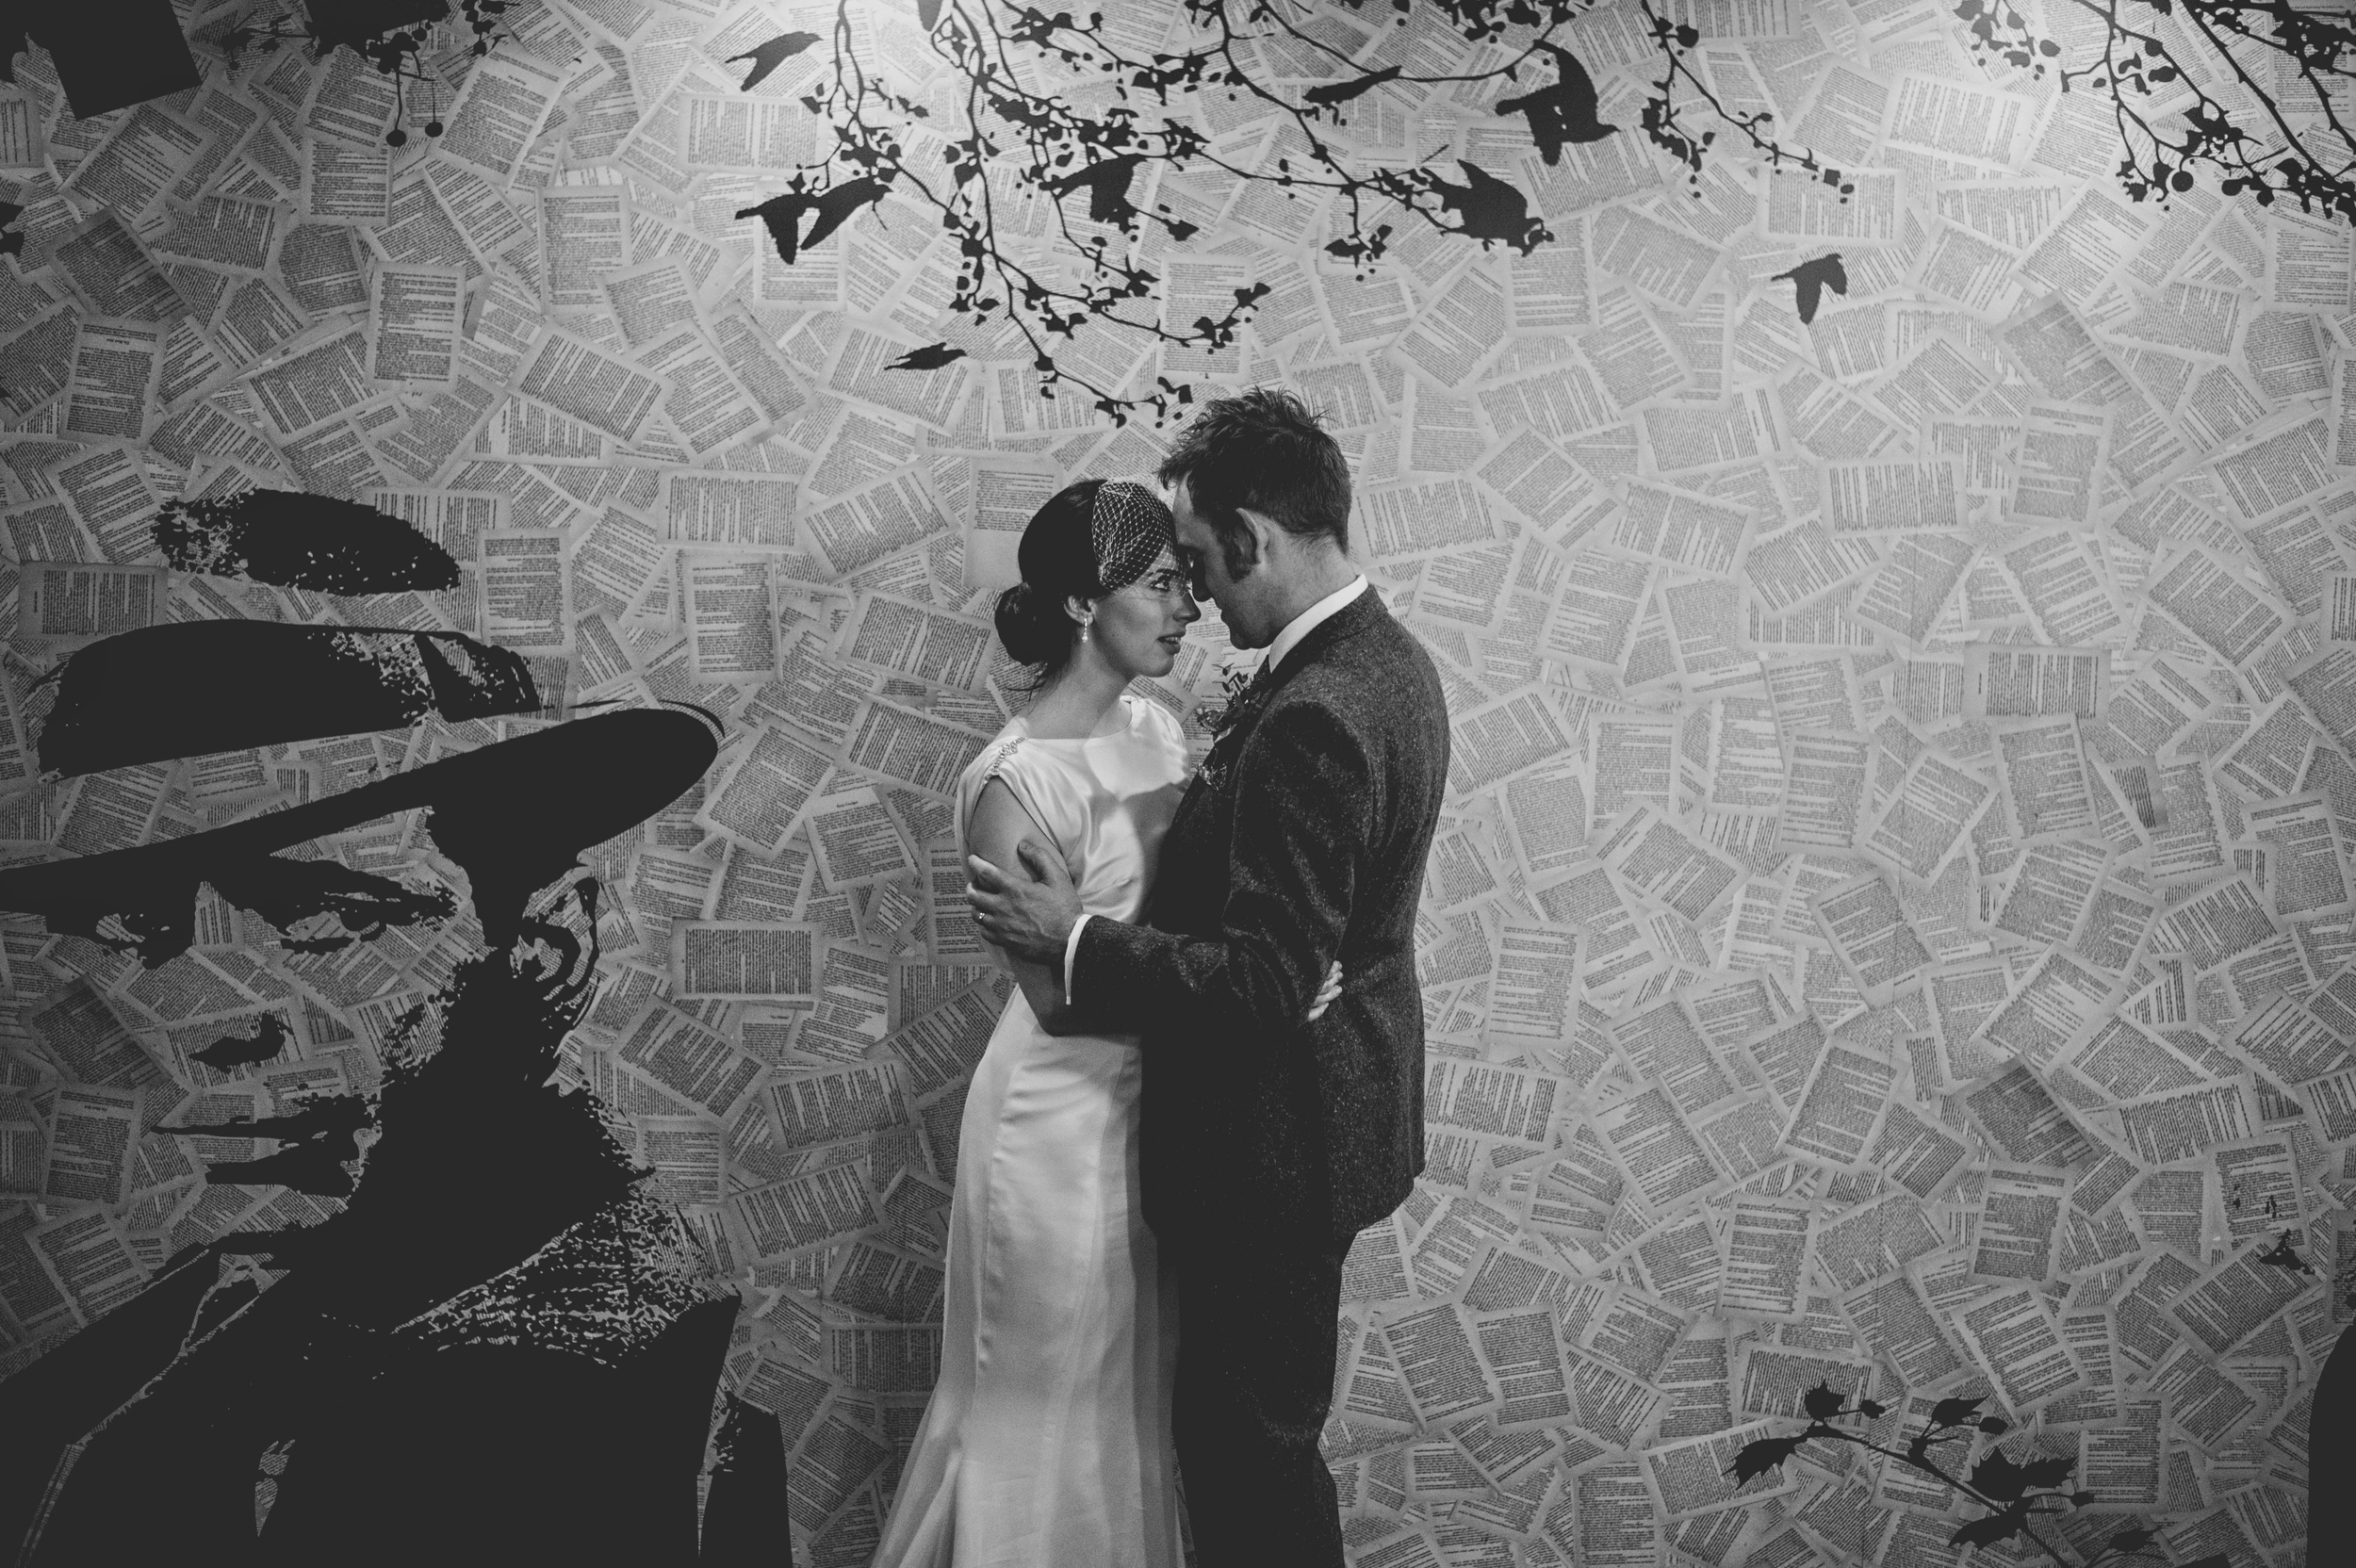 Wedding couple at graffiti wall